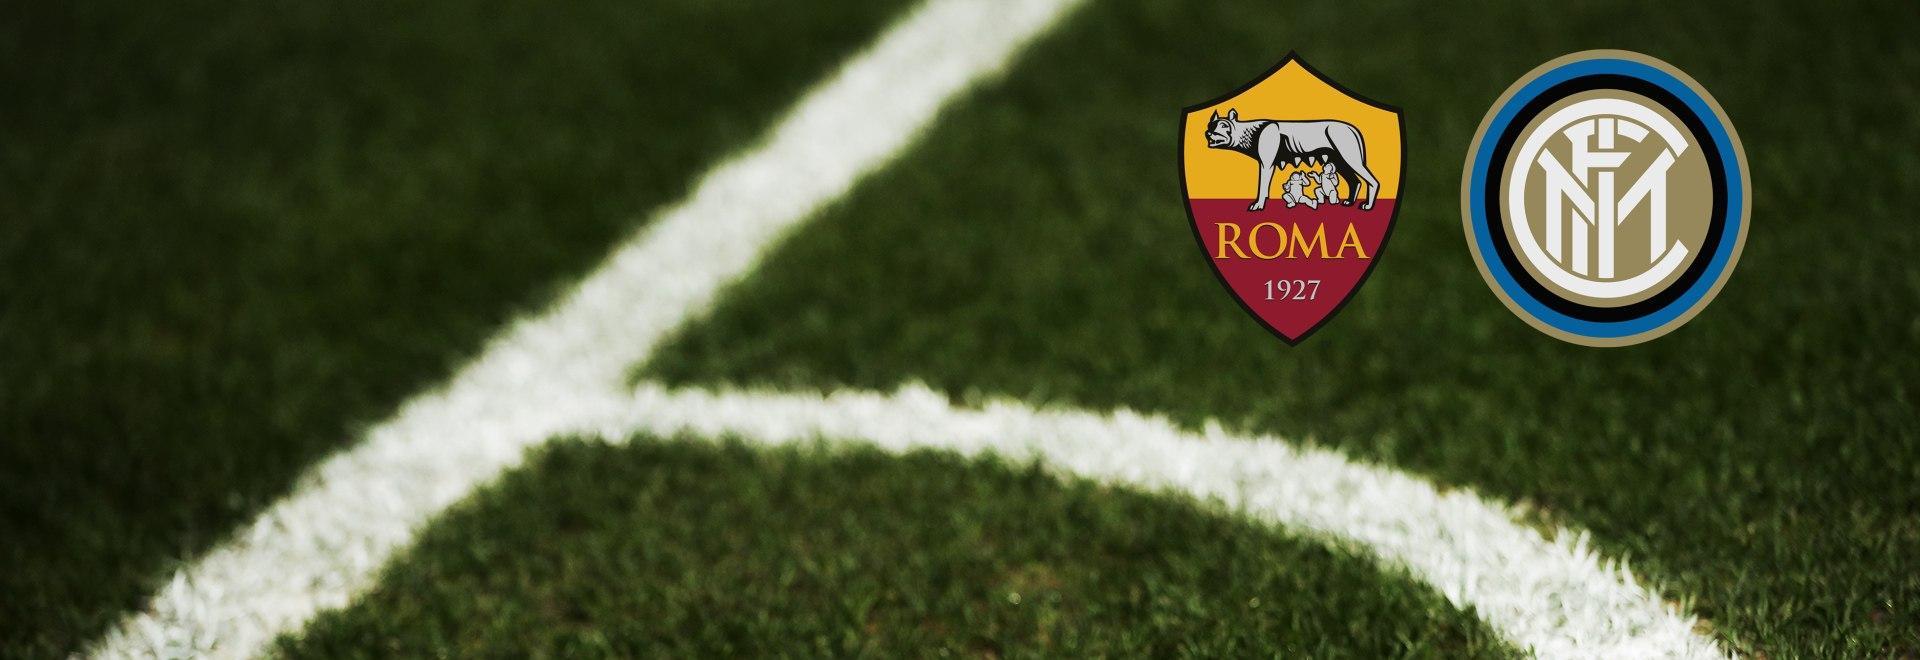 Roma - Inter. 17a g.